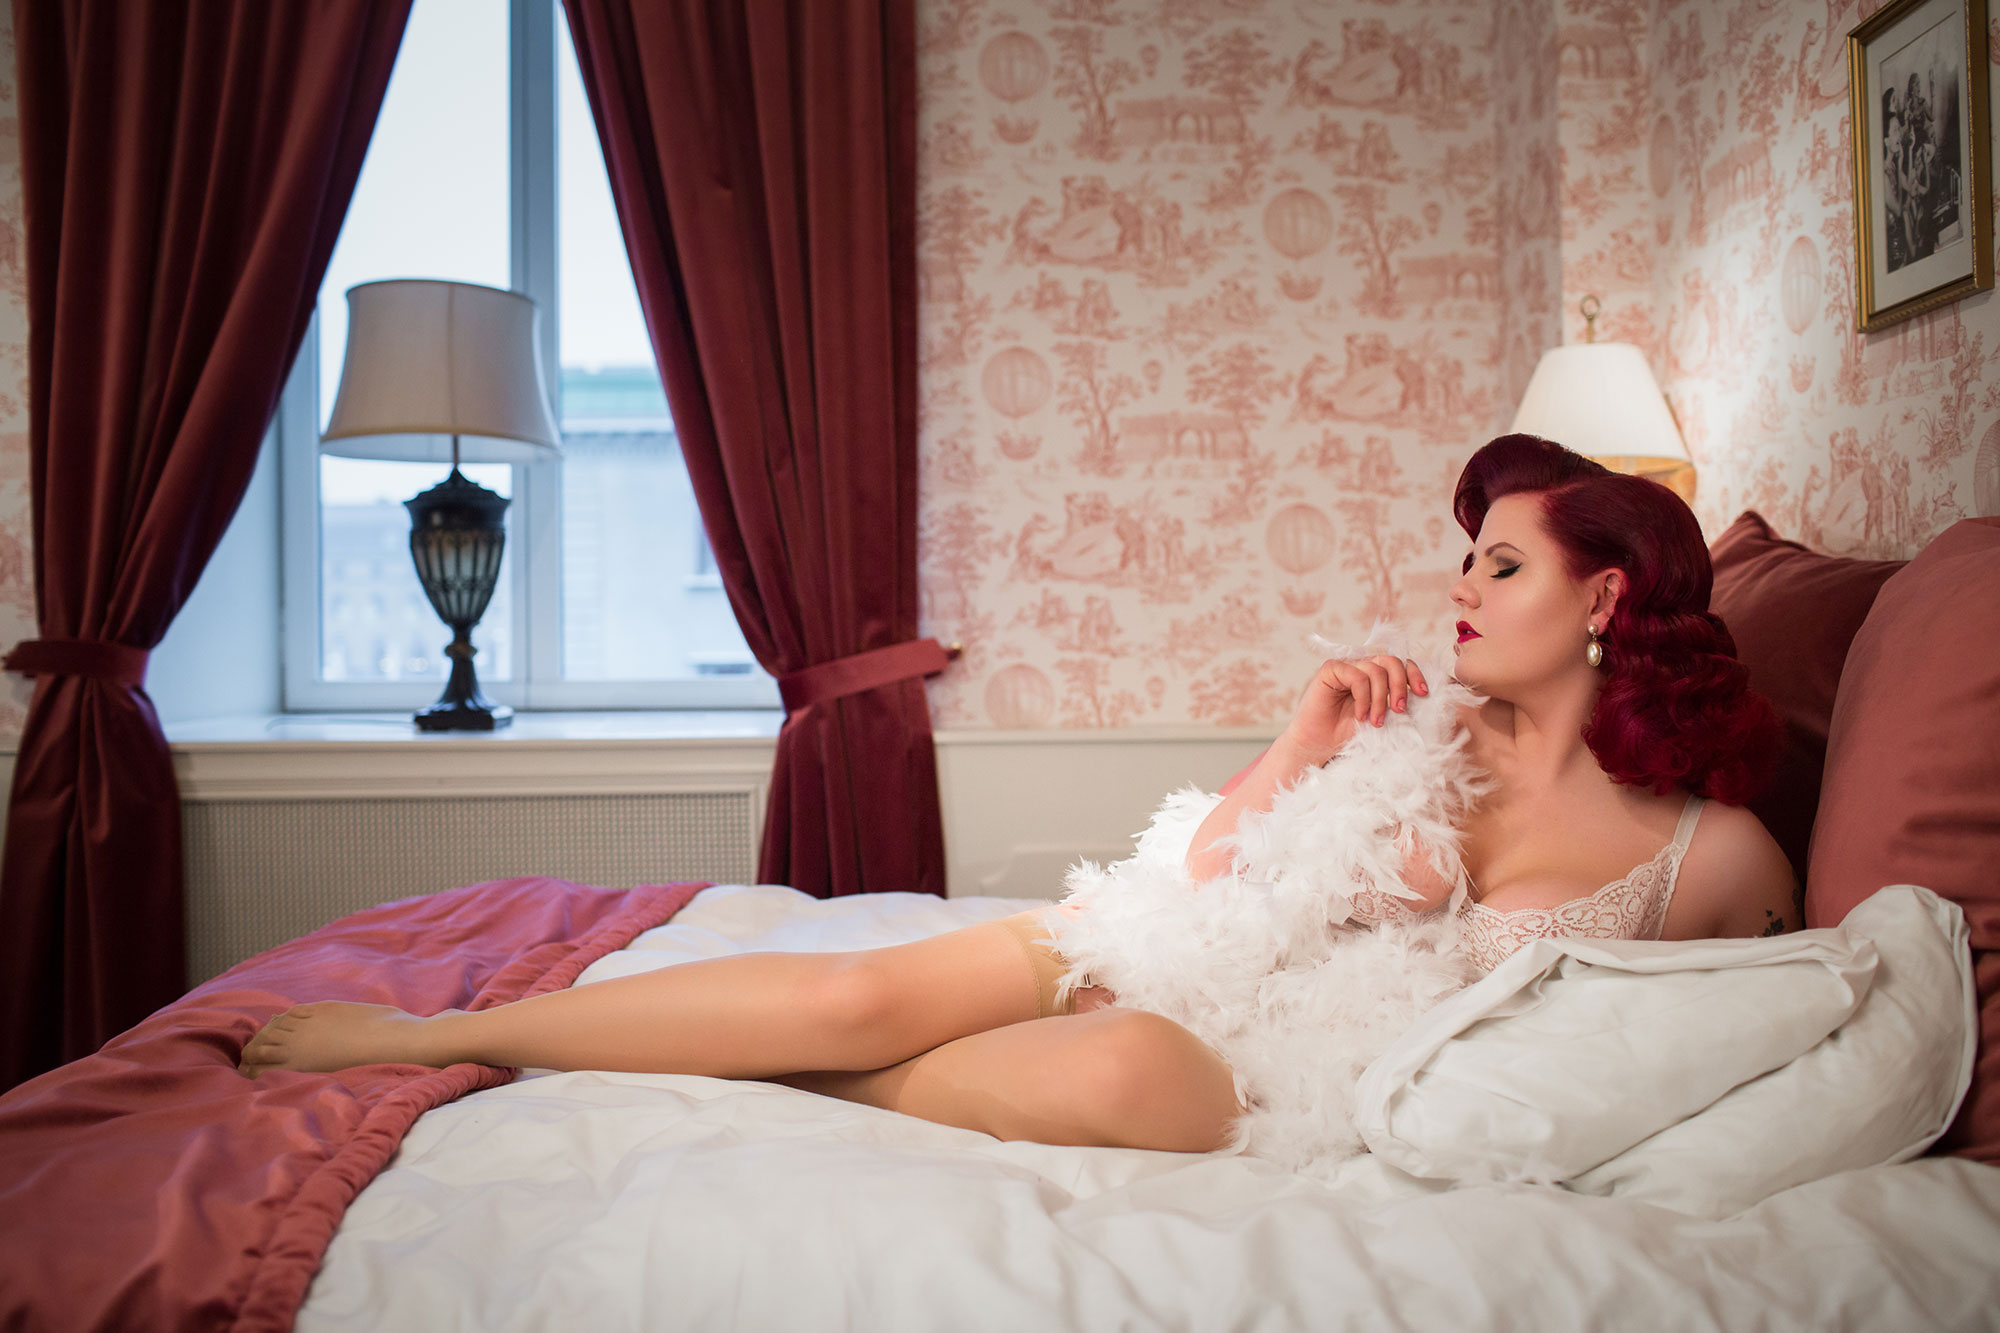 Mimi Le Rouge vintage boudoir makeover Hotel Pigalle Gothenburg © Tigz Rice 2018. https://www.tigzrice.com